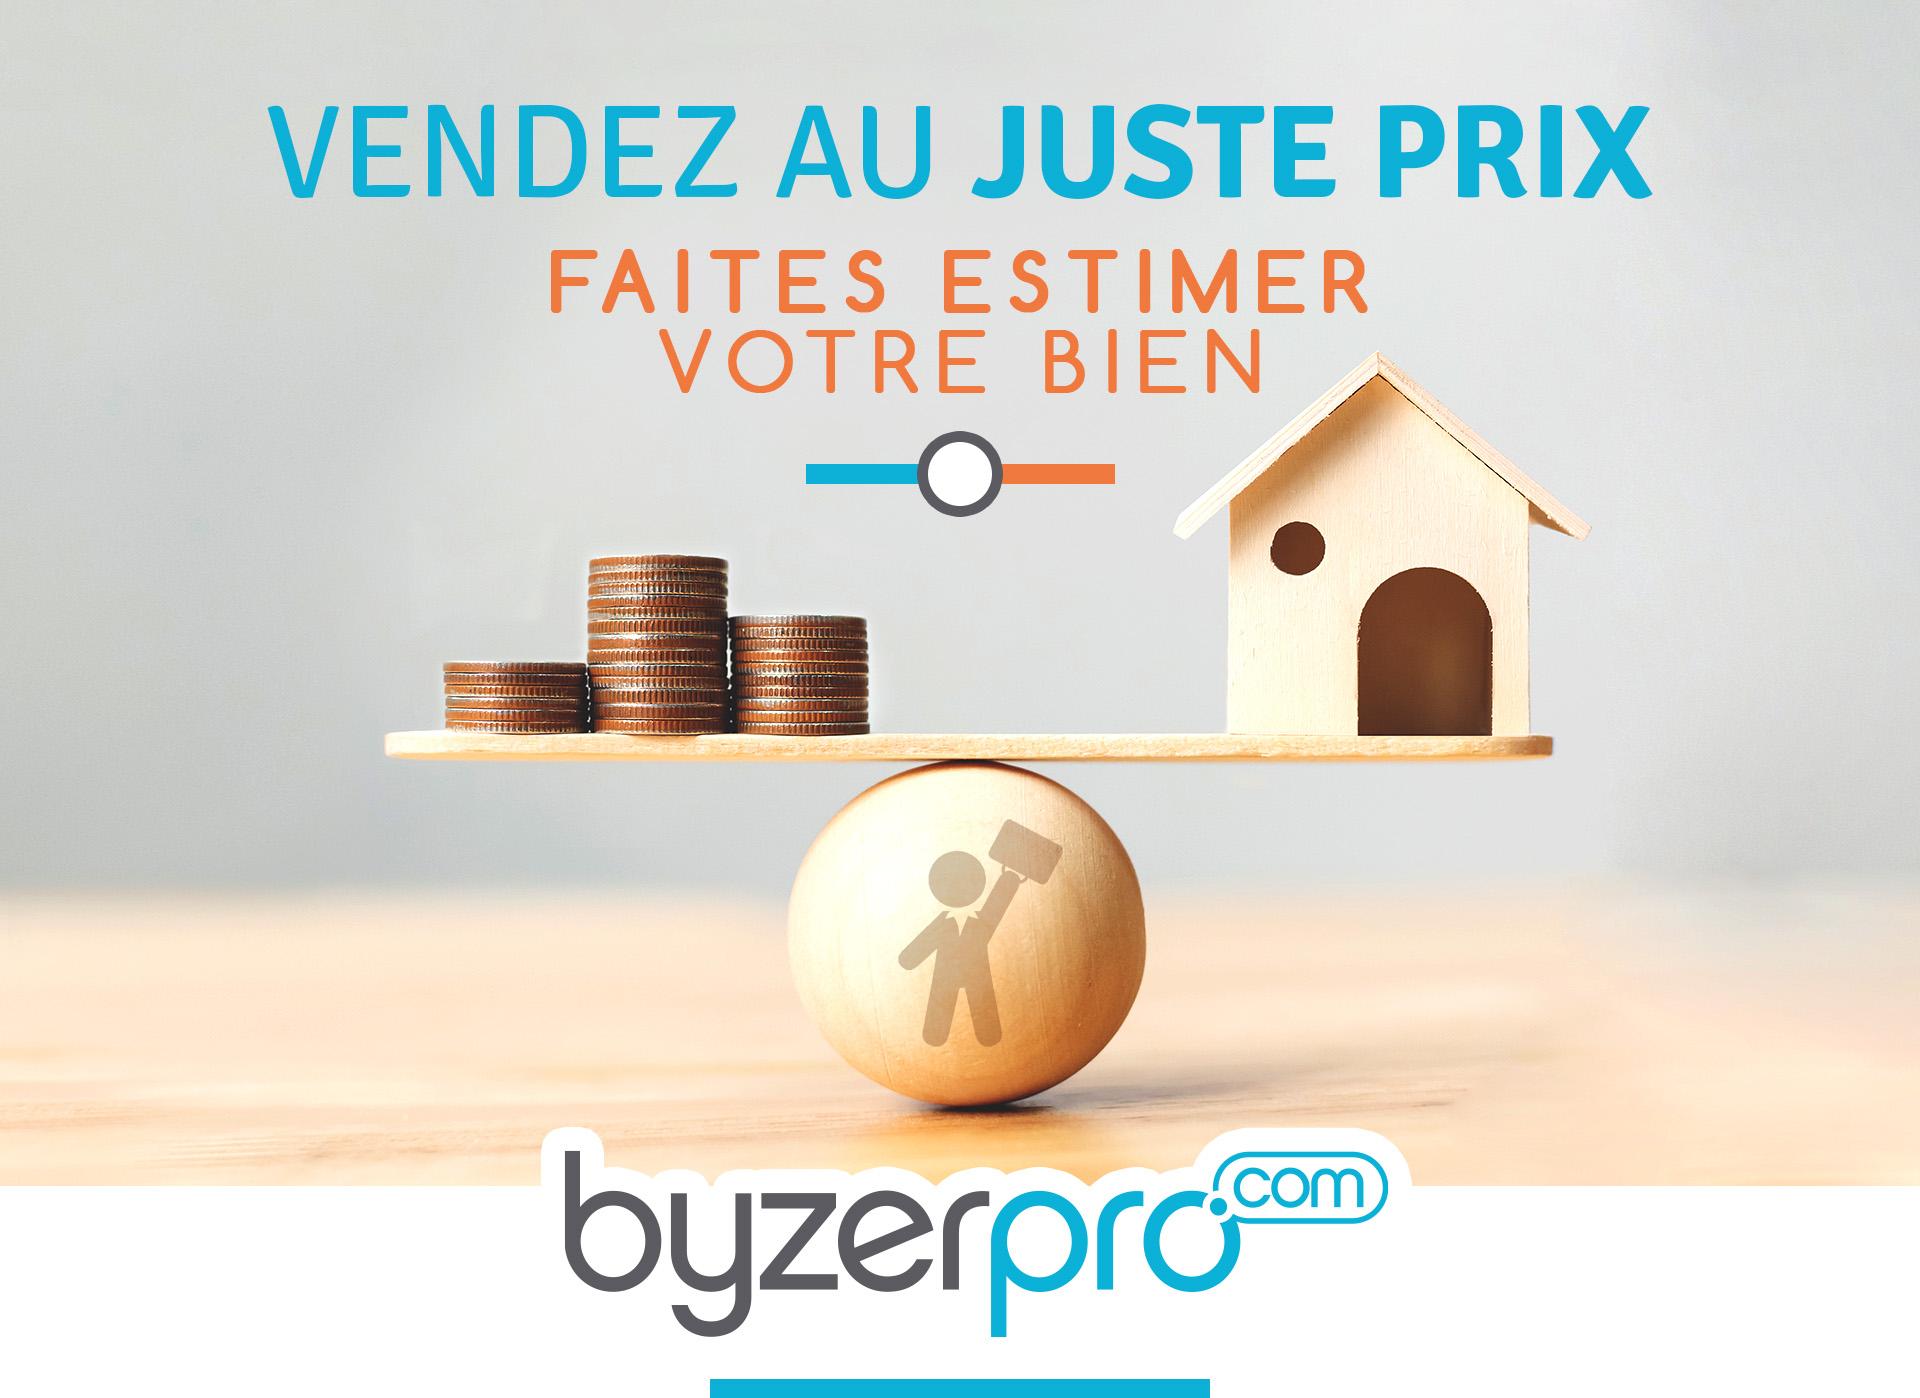 Estimer son bien immobilier, Byzerpro.com